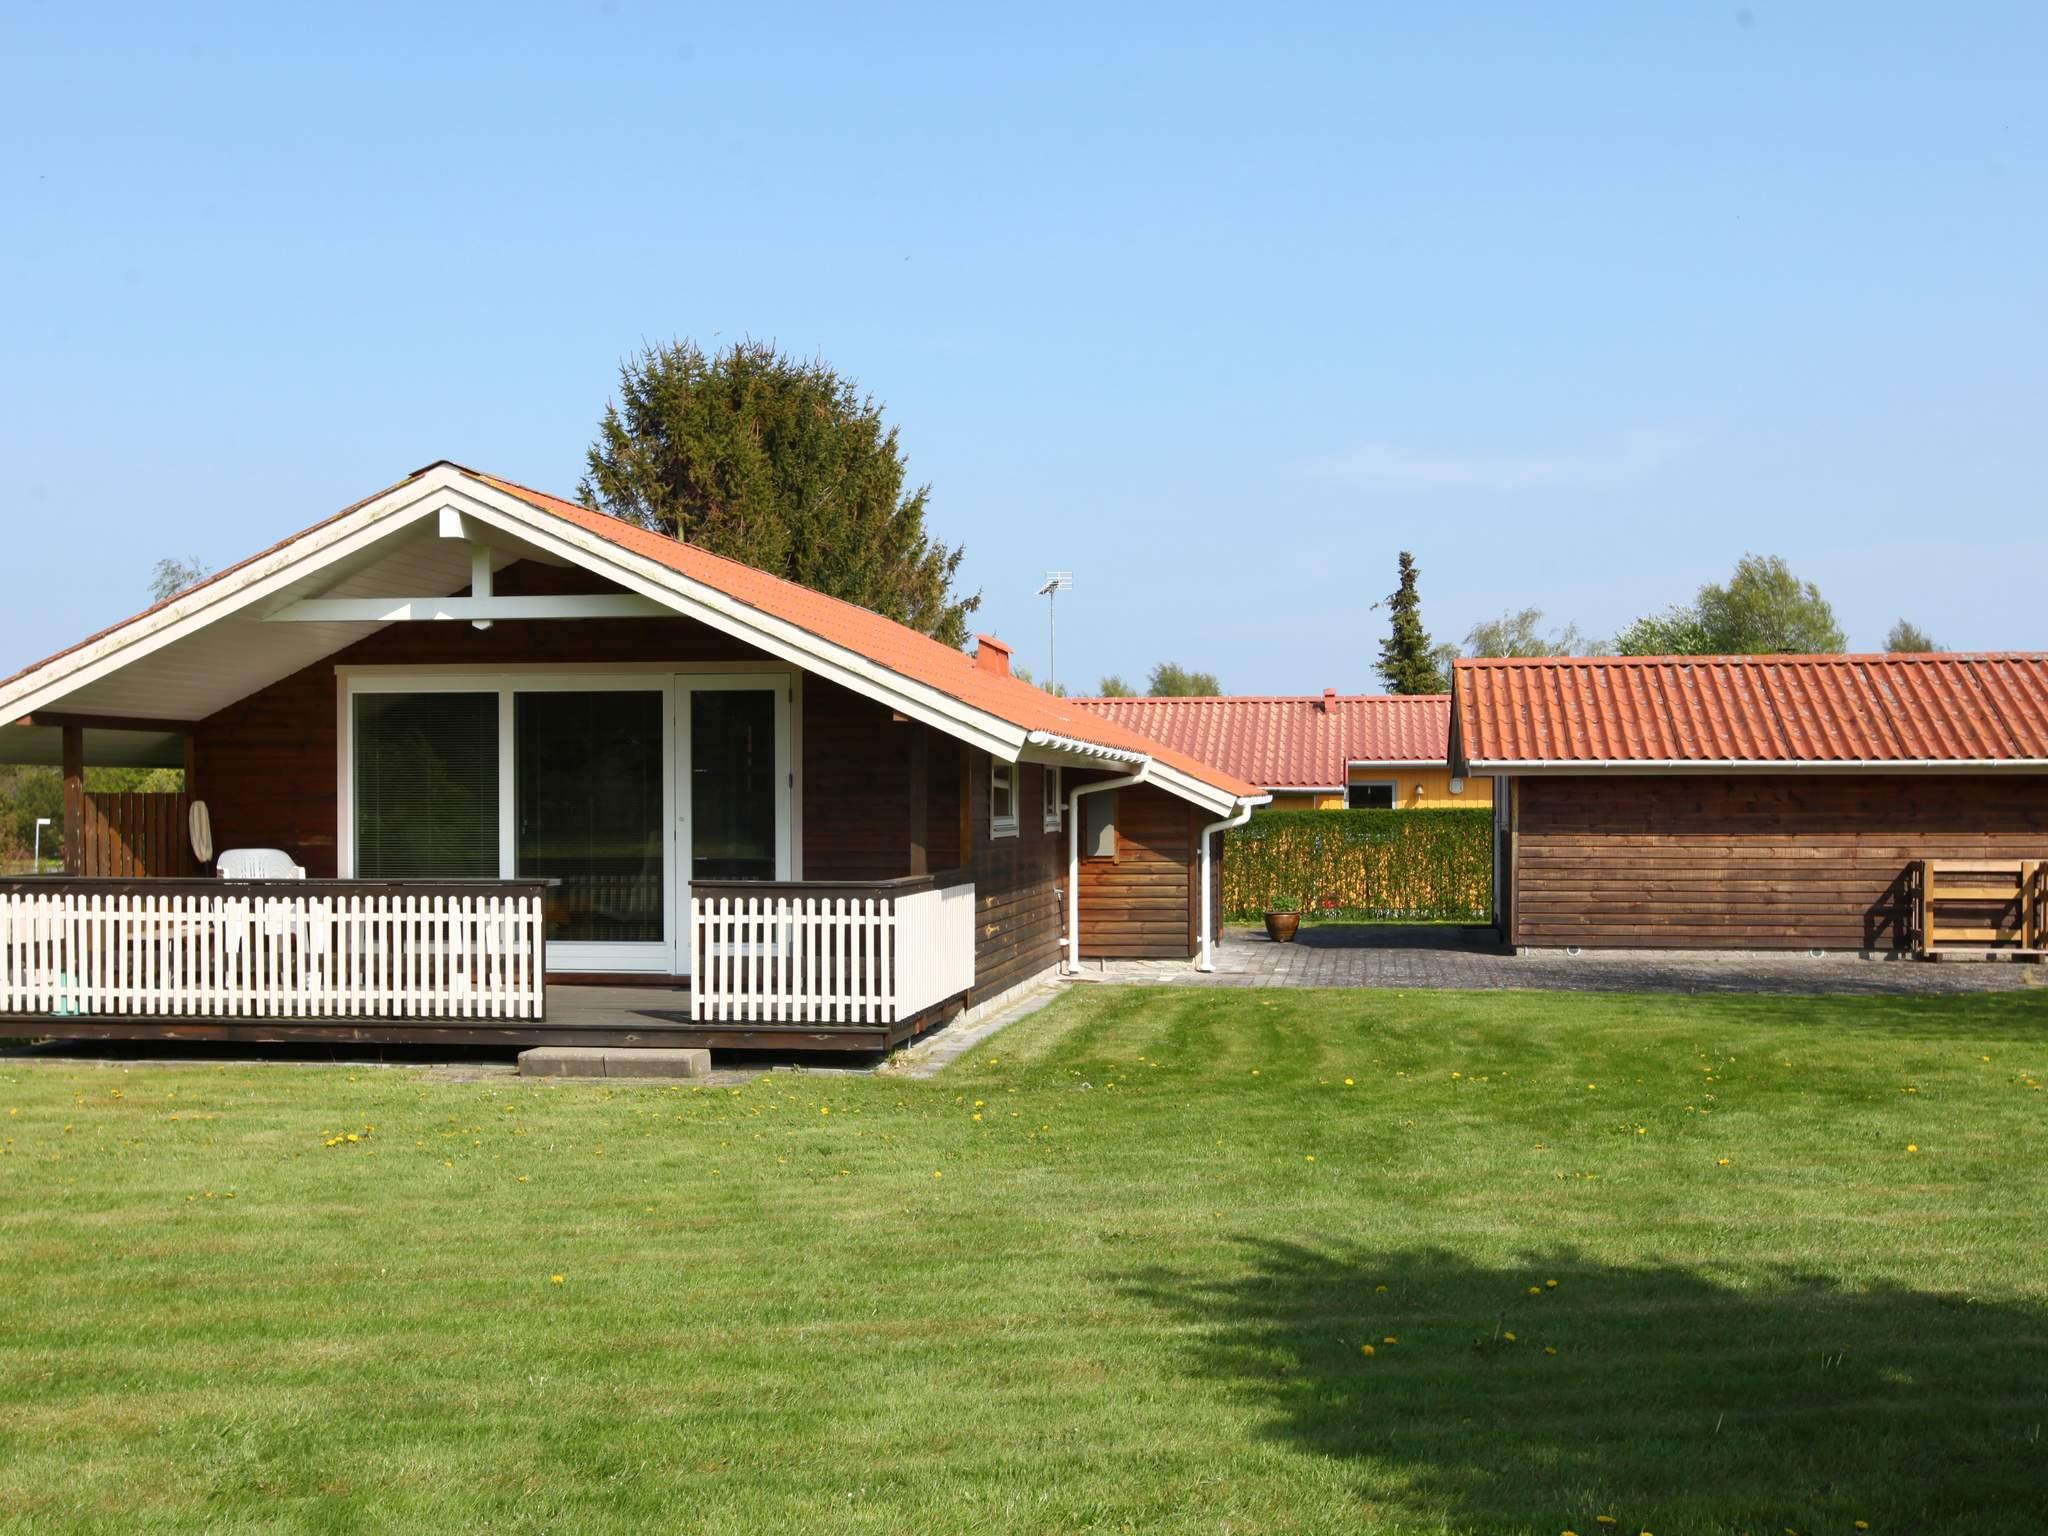 Ferienhaus Hyllingeriis (619896), Skibby, , Nordseeland, Dänemark, Bild 22